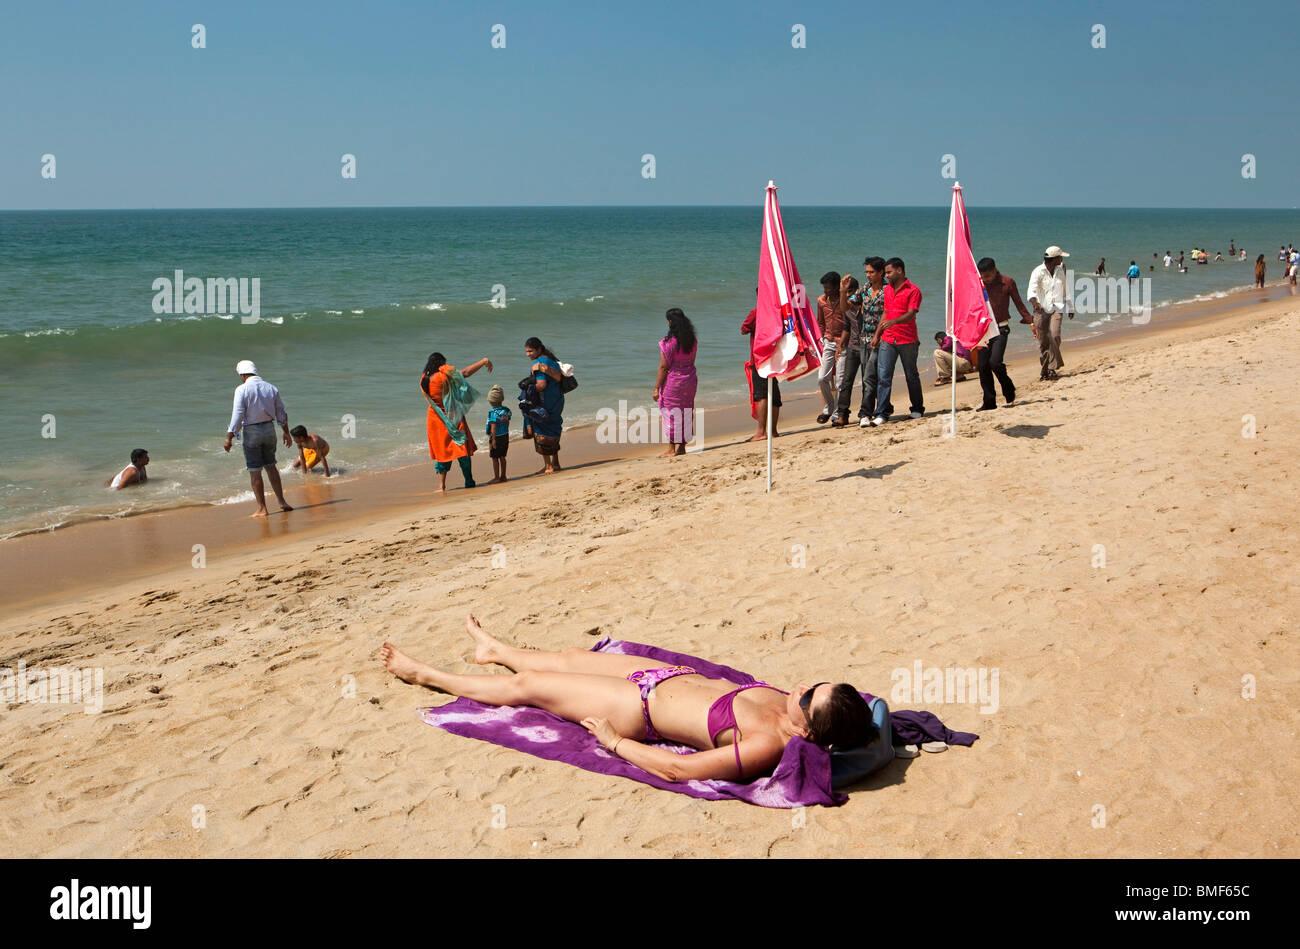 India, Kerala, Vypeen Island, Cherai Beach western sunbather amongst fully dressed Indian visitors - Stock Image